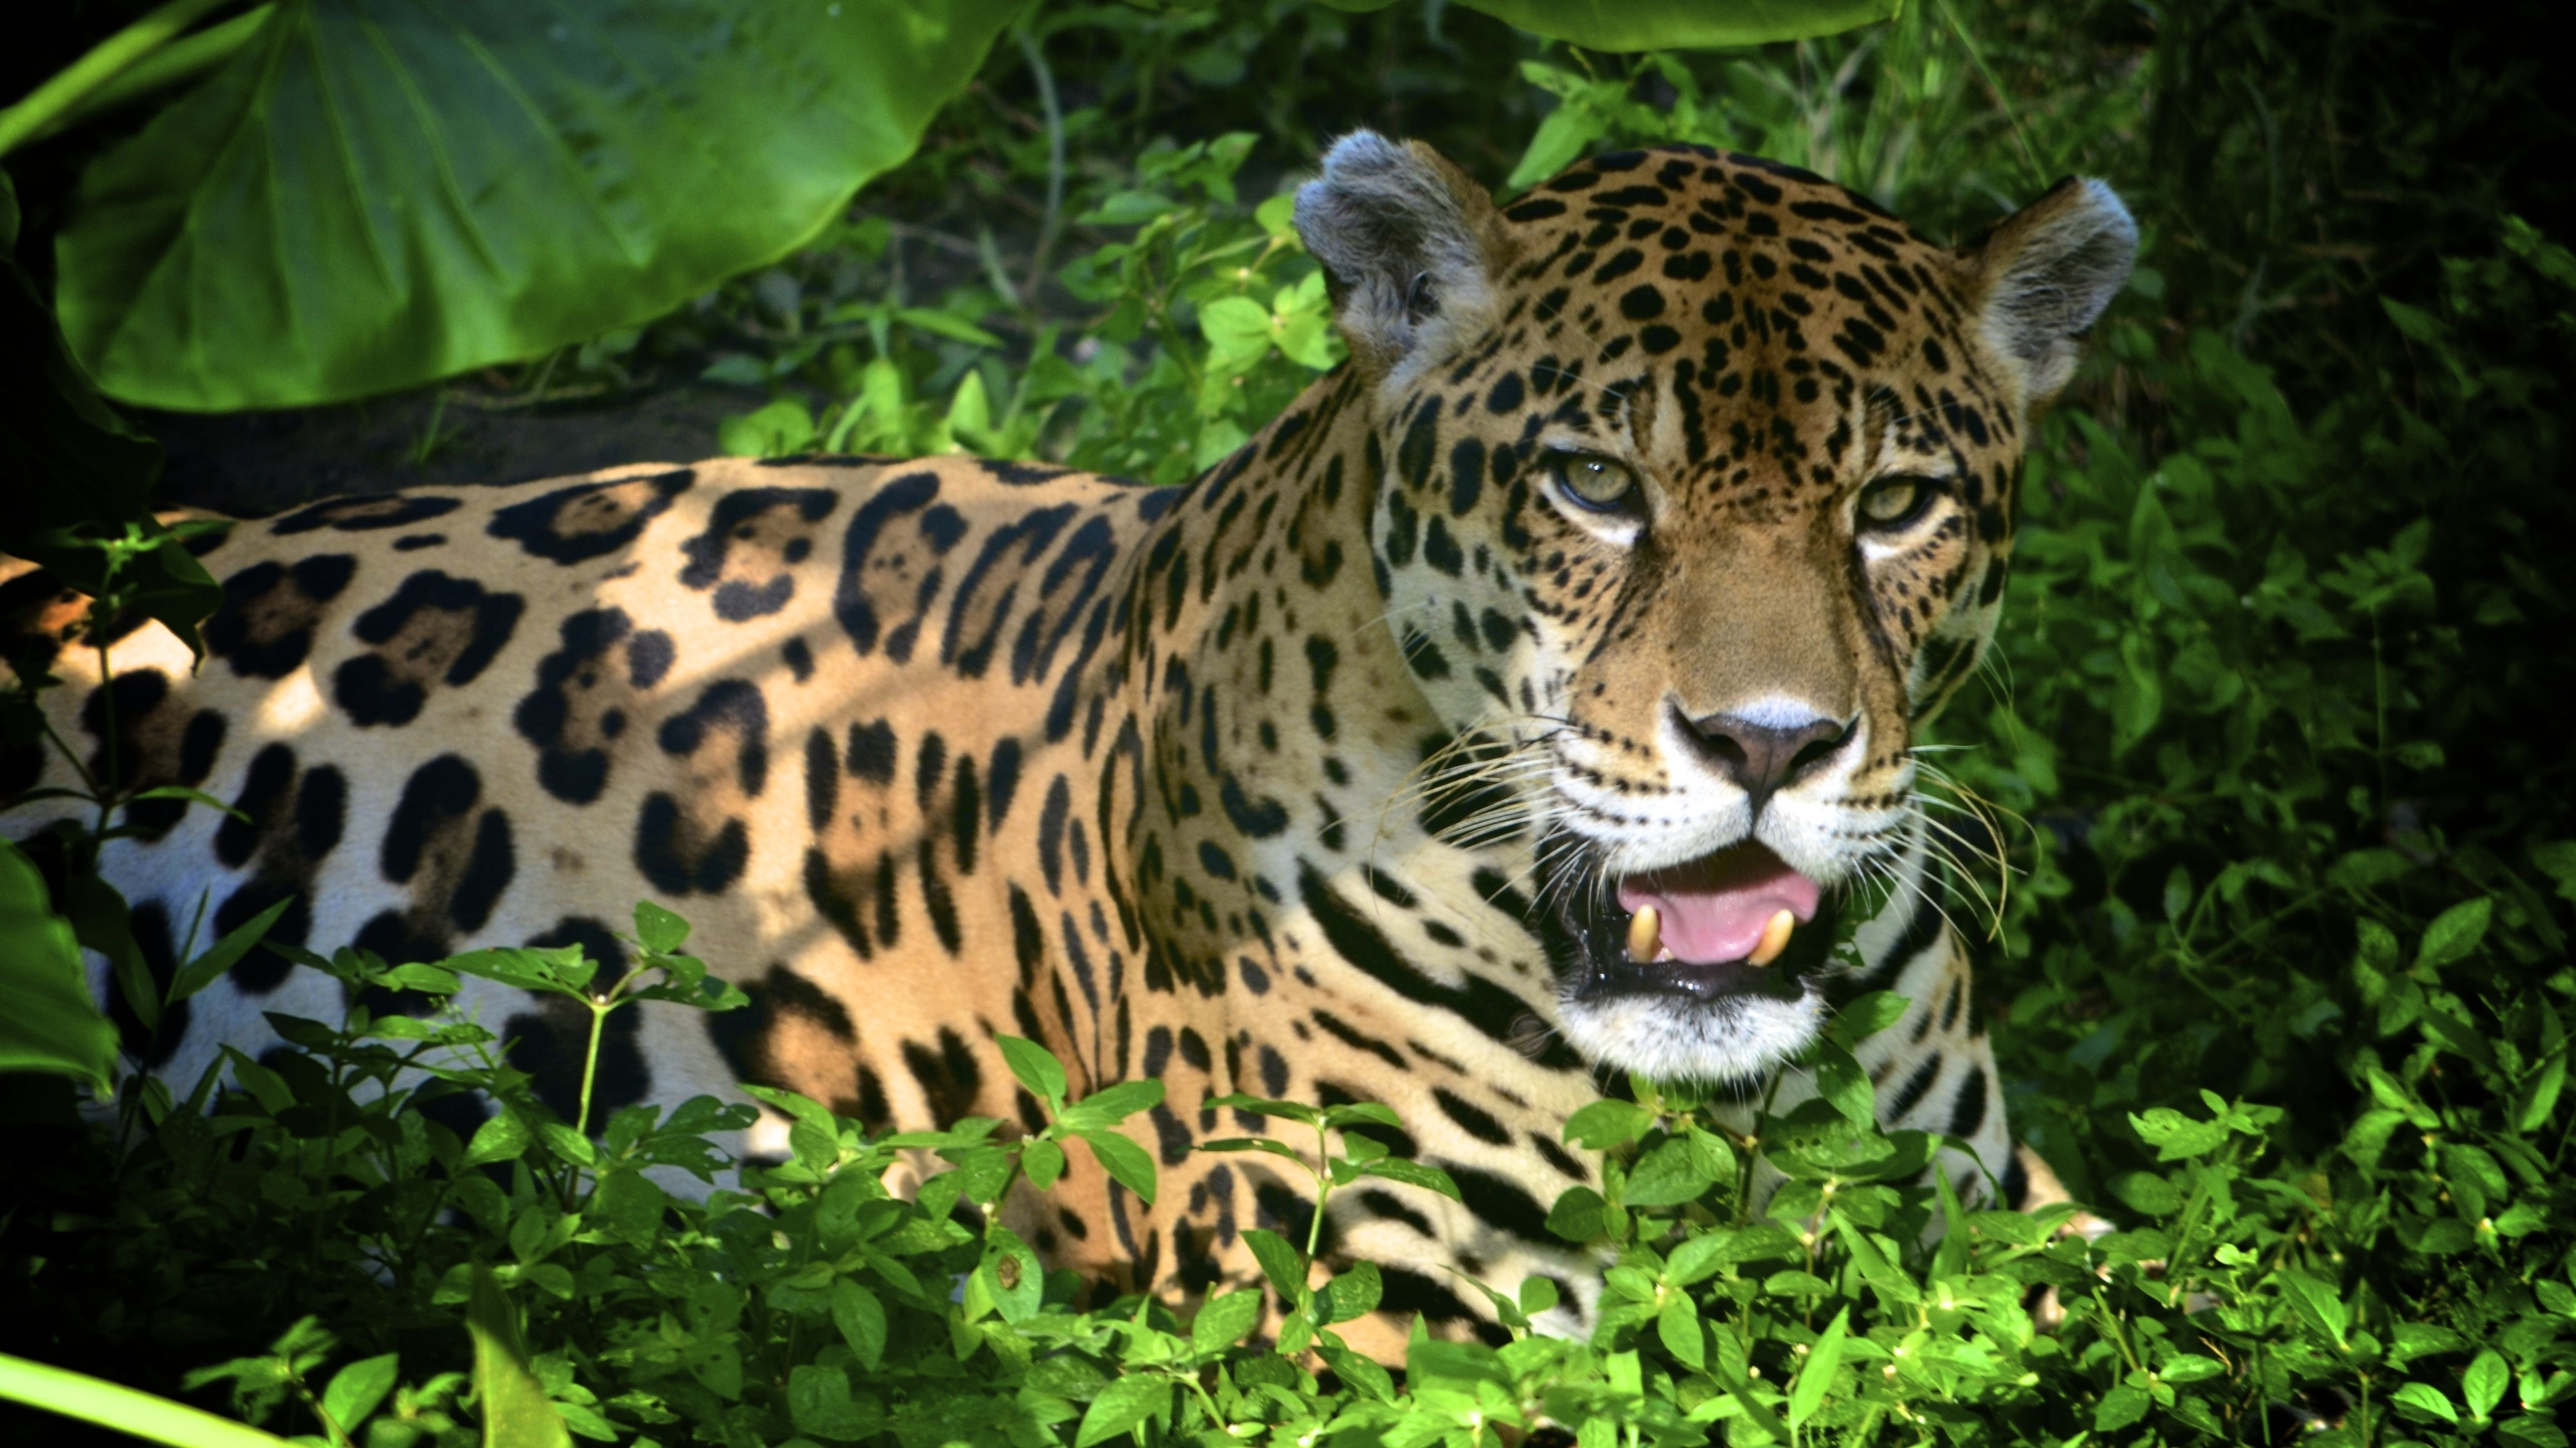 Jaguar In The Amazon Rainforest Amazon Forest Amazon Rainforest Rainforest